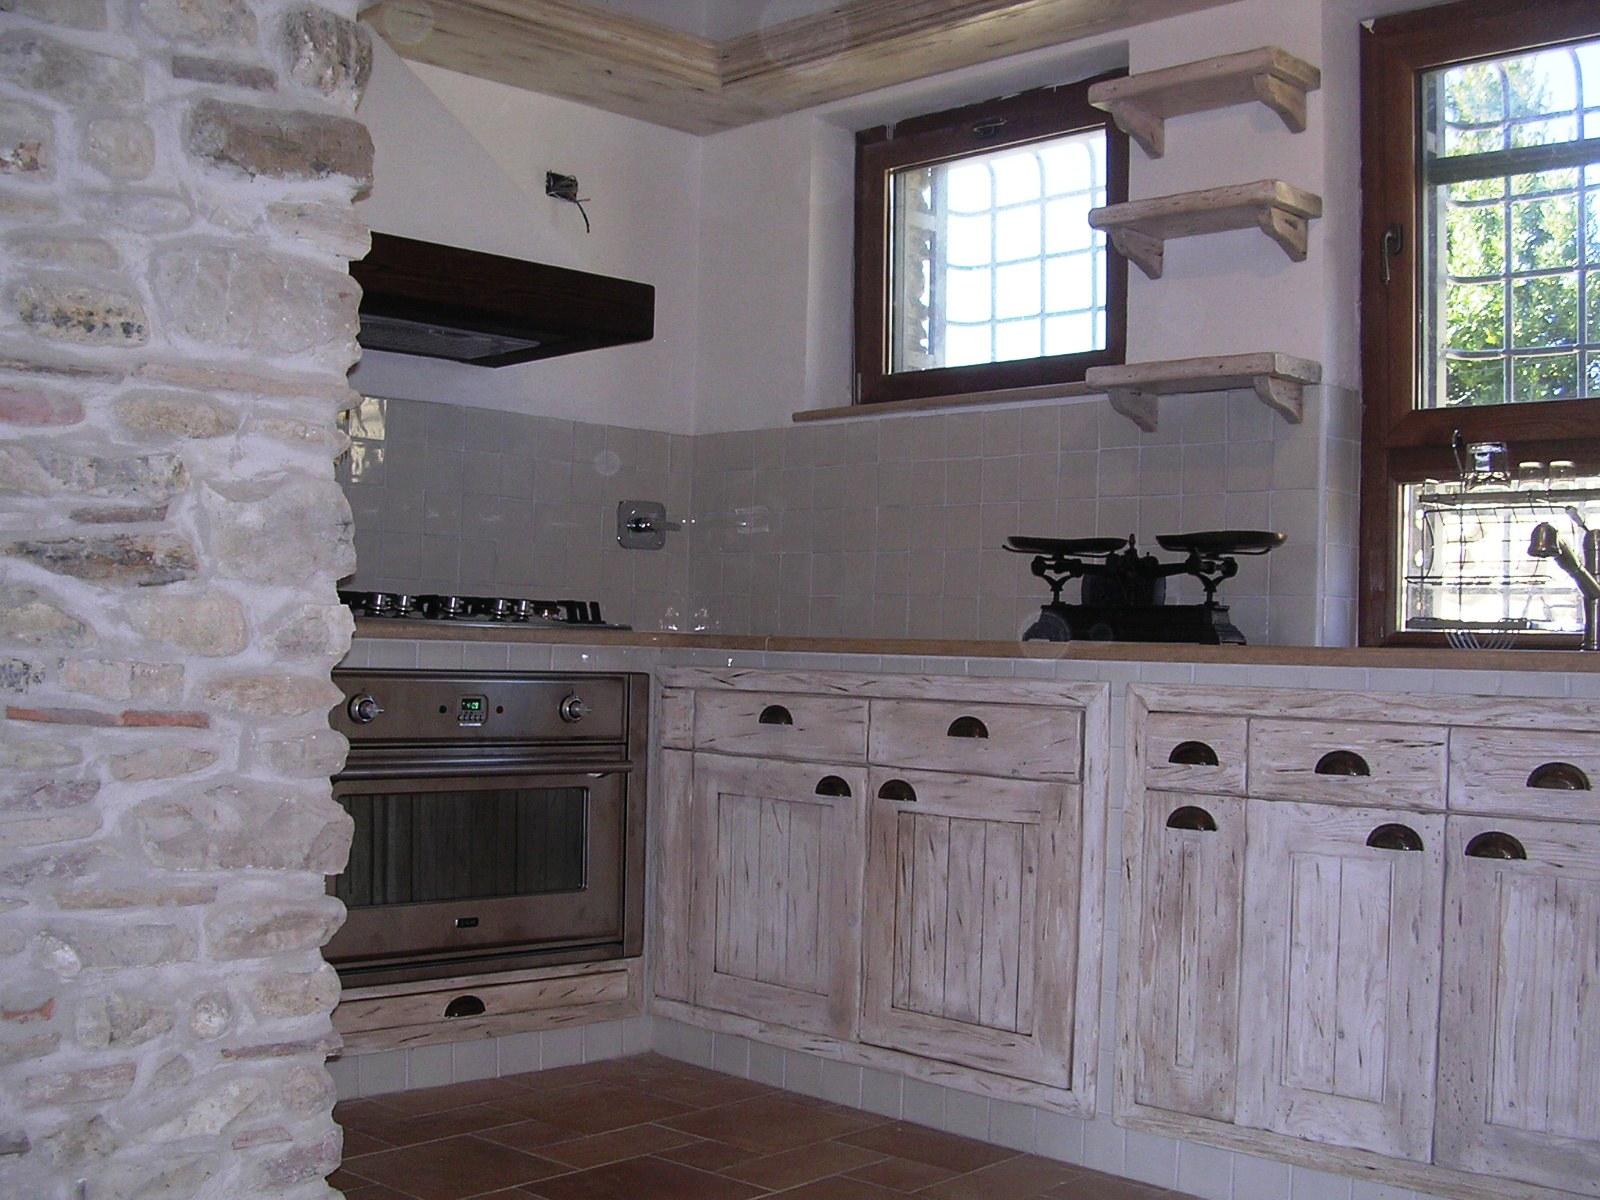 Cucine falegnameria rd arredamenti s r l roma armadi su - Cucine componibili bianche ...